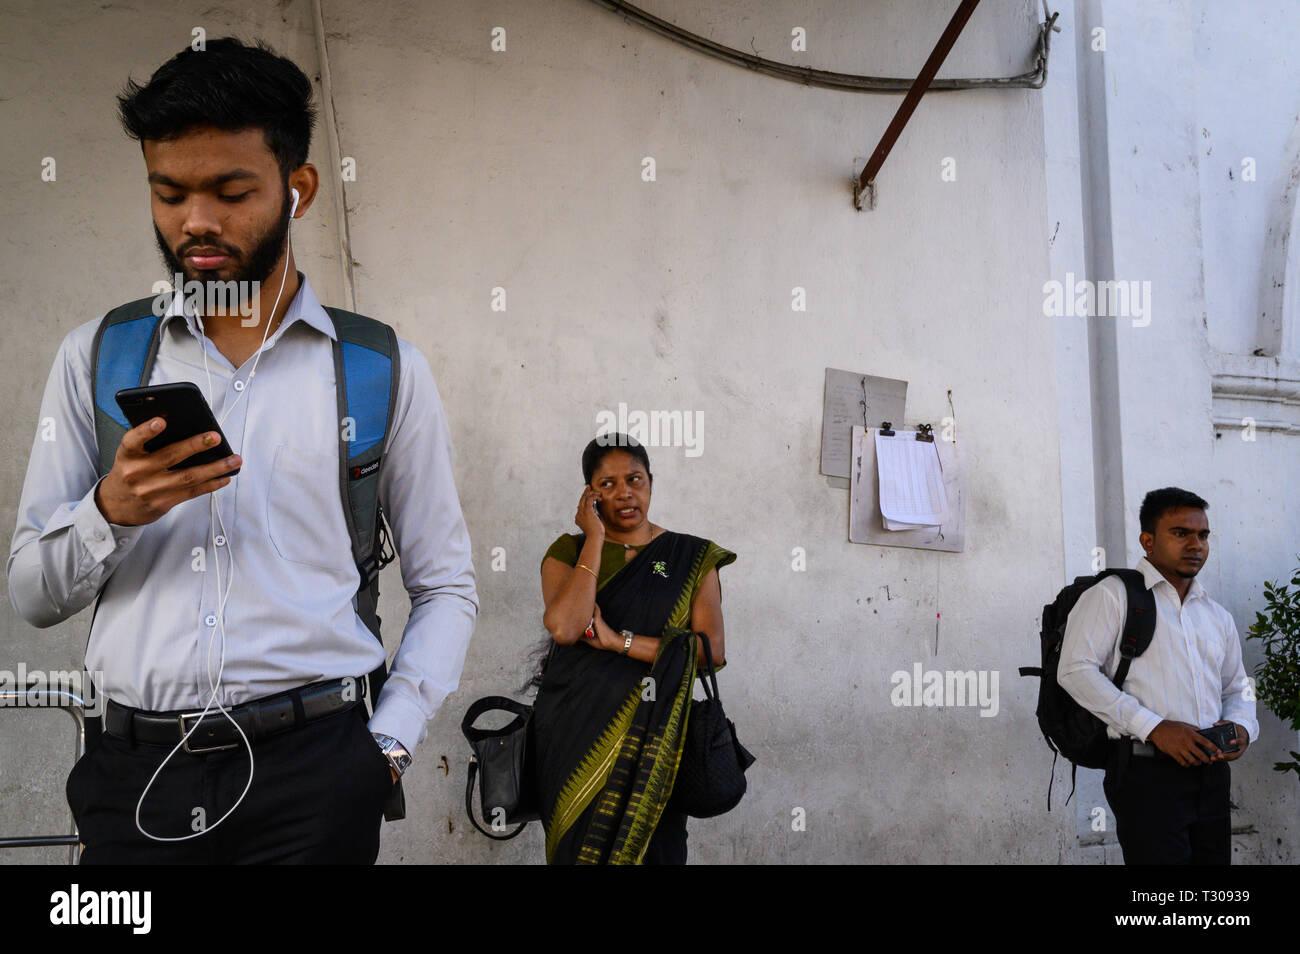 People using their mobile phones, Colombo, Sri Lanka Stock Photo